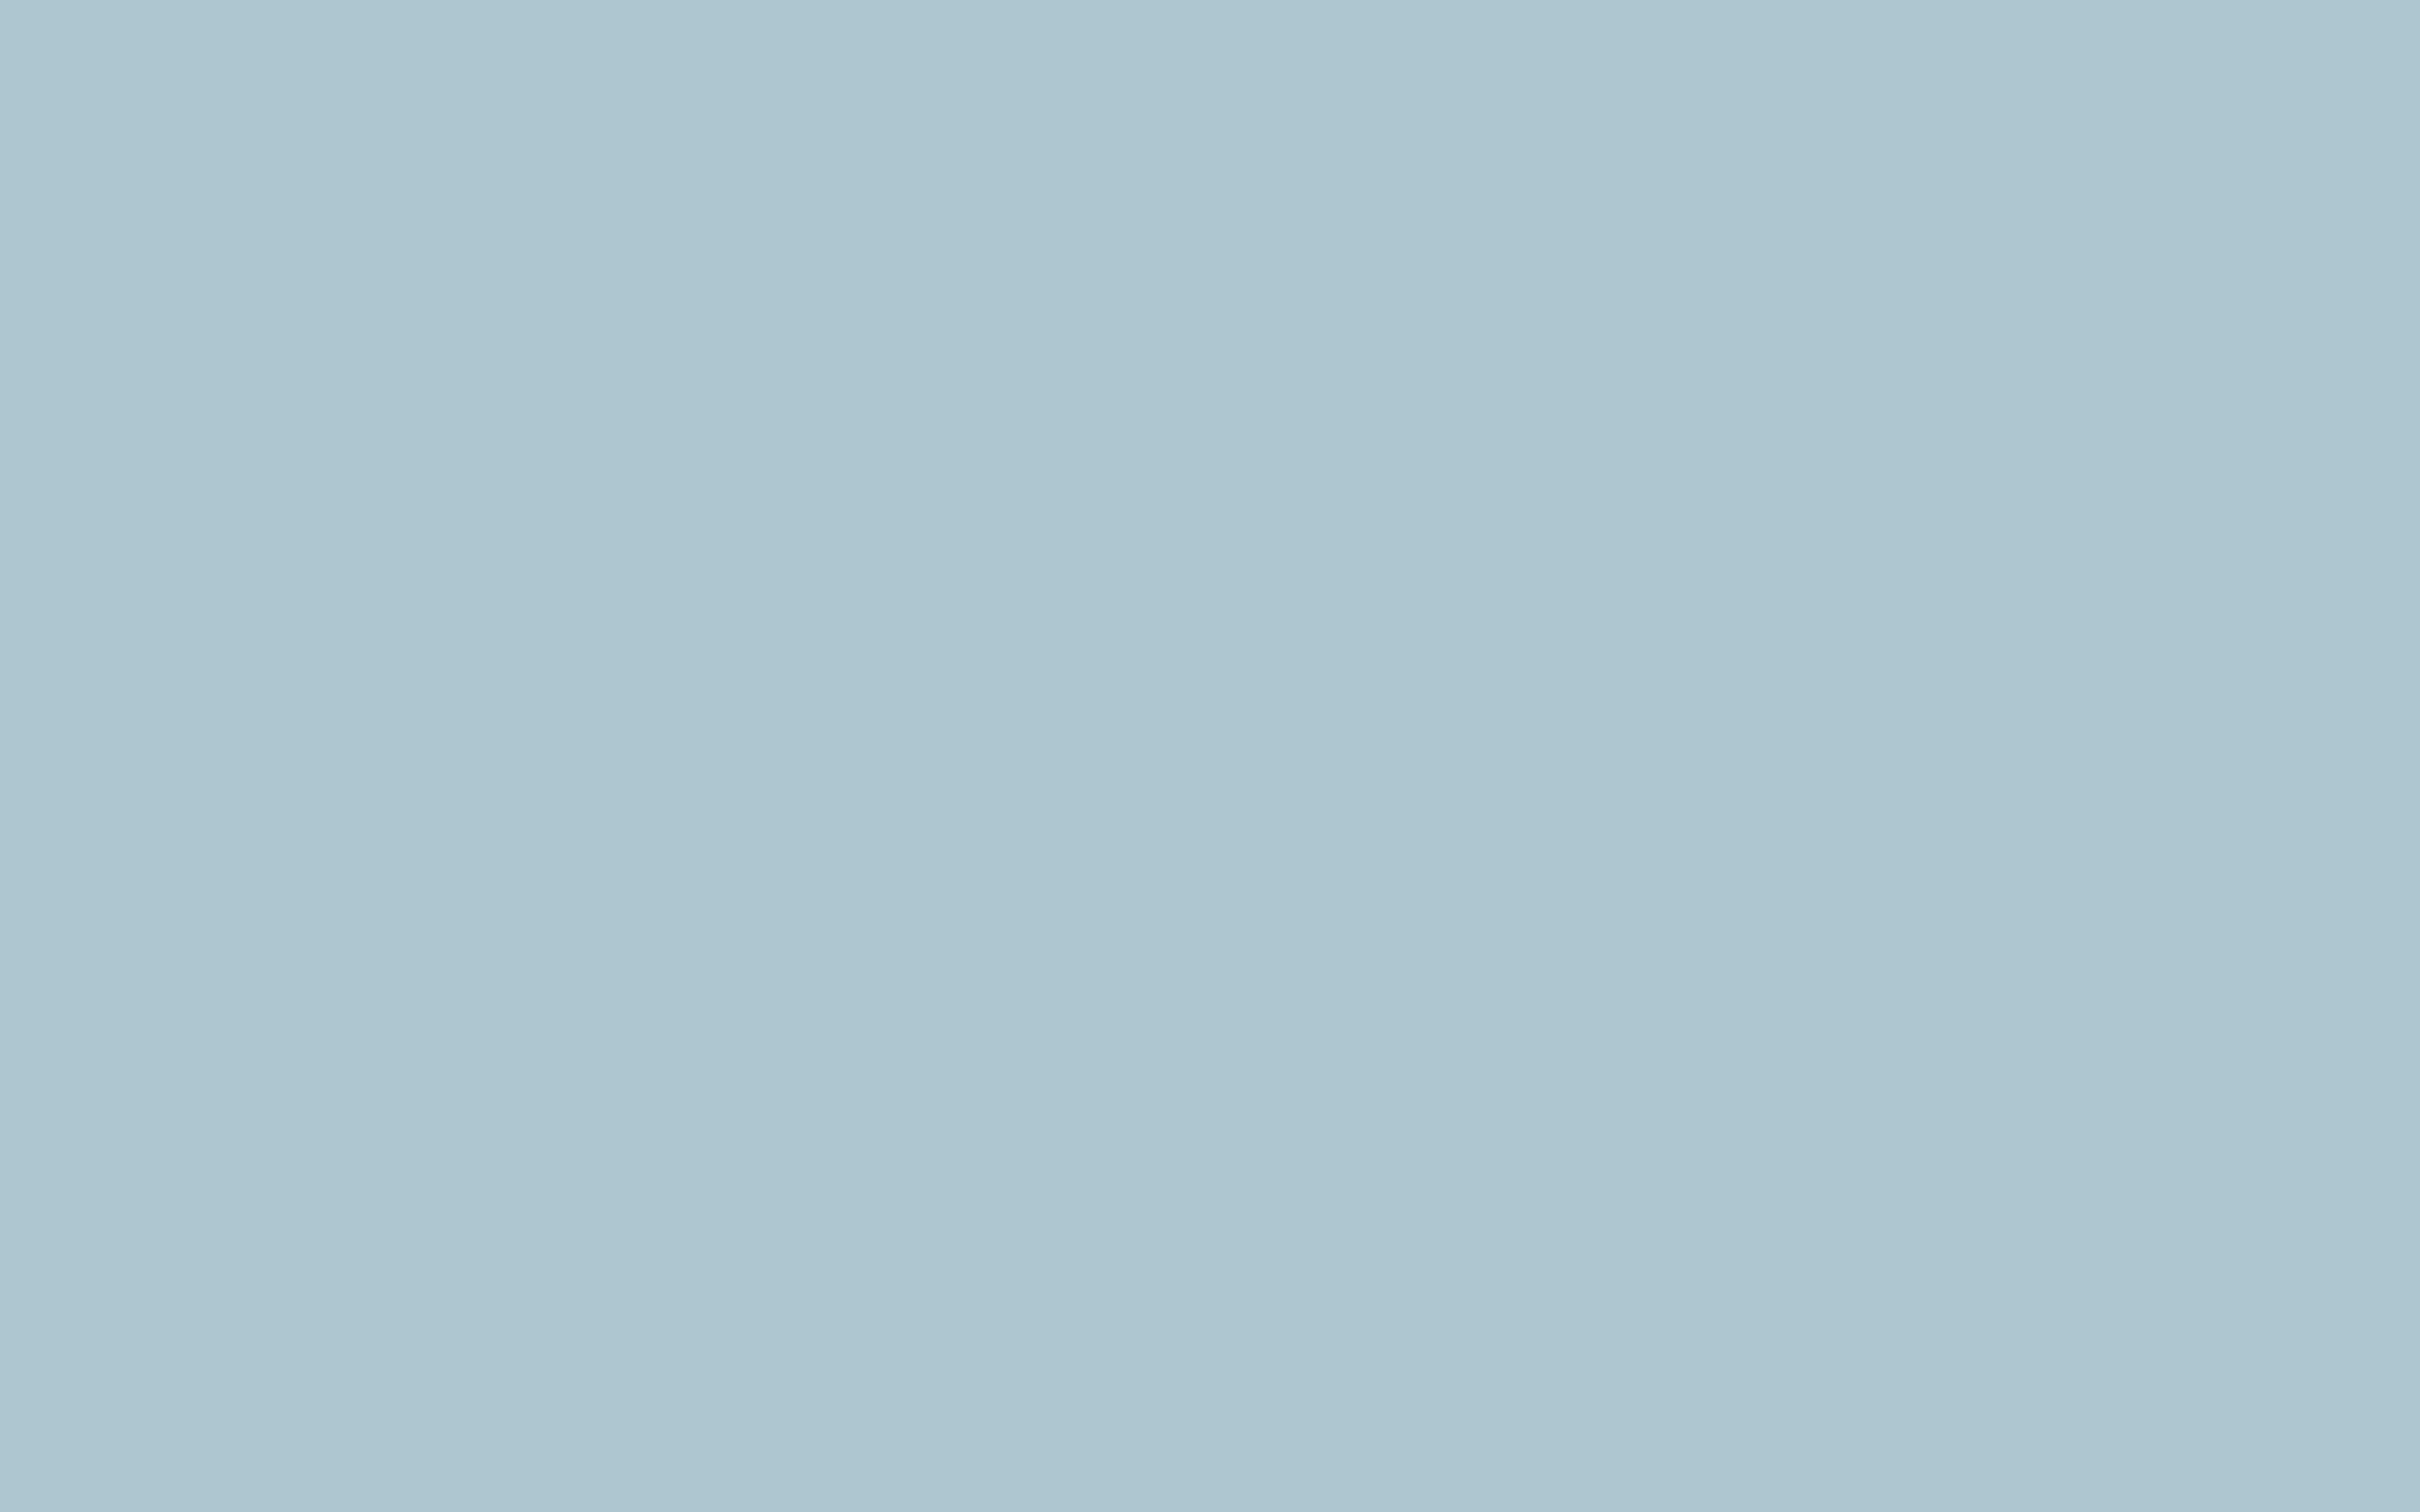 2560x1600 Pastel Blue Solid Color Background